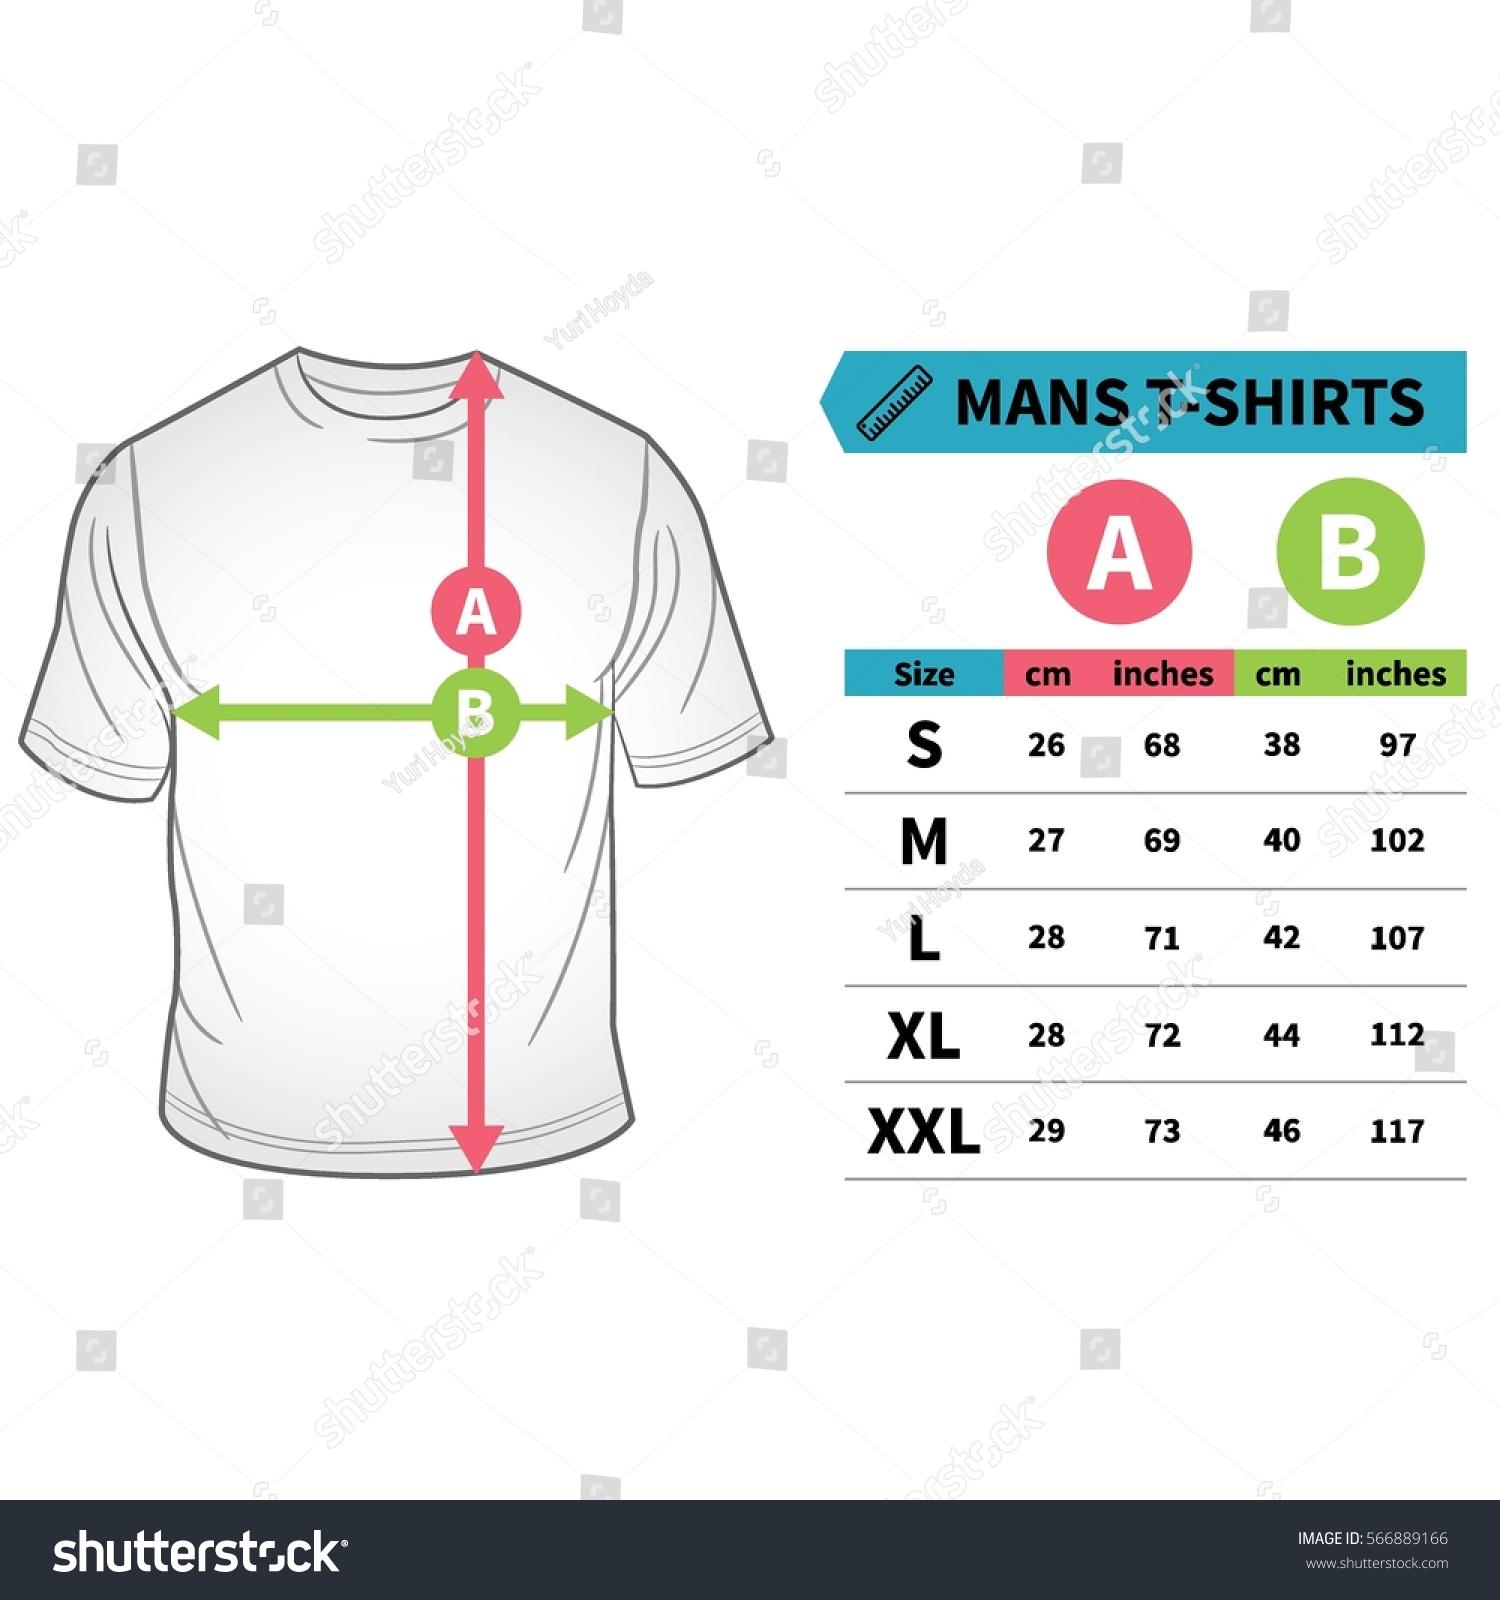 Mens Tshirts Polo Shirts Size Guide Stock Vector (Royalty Free ...